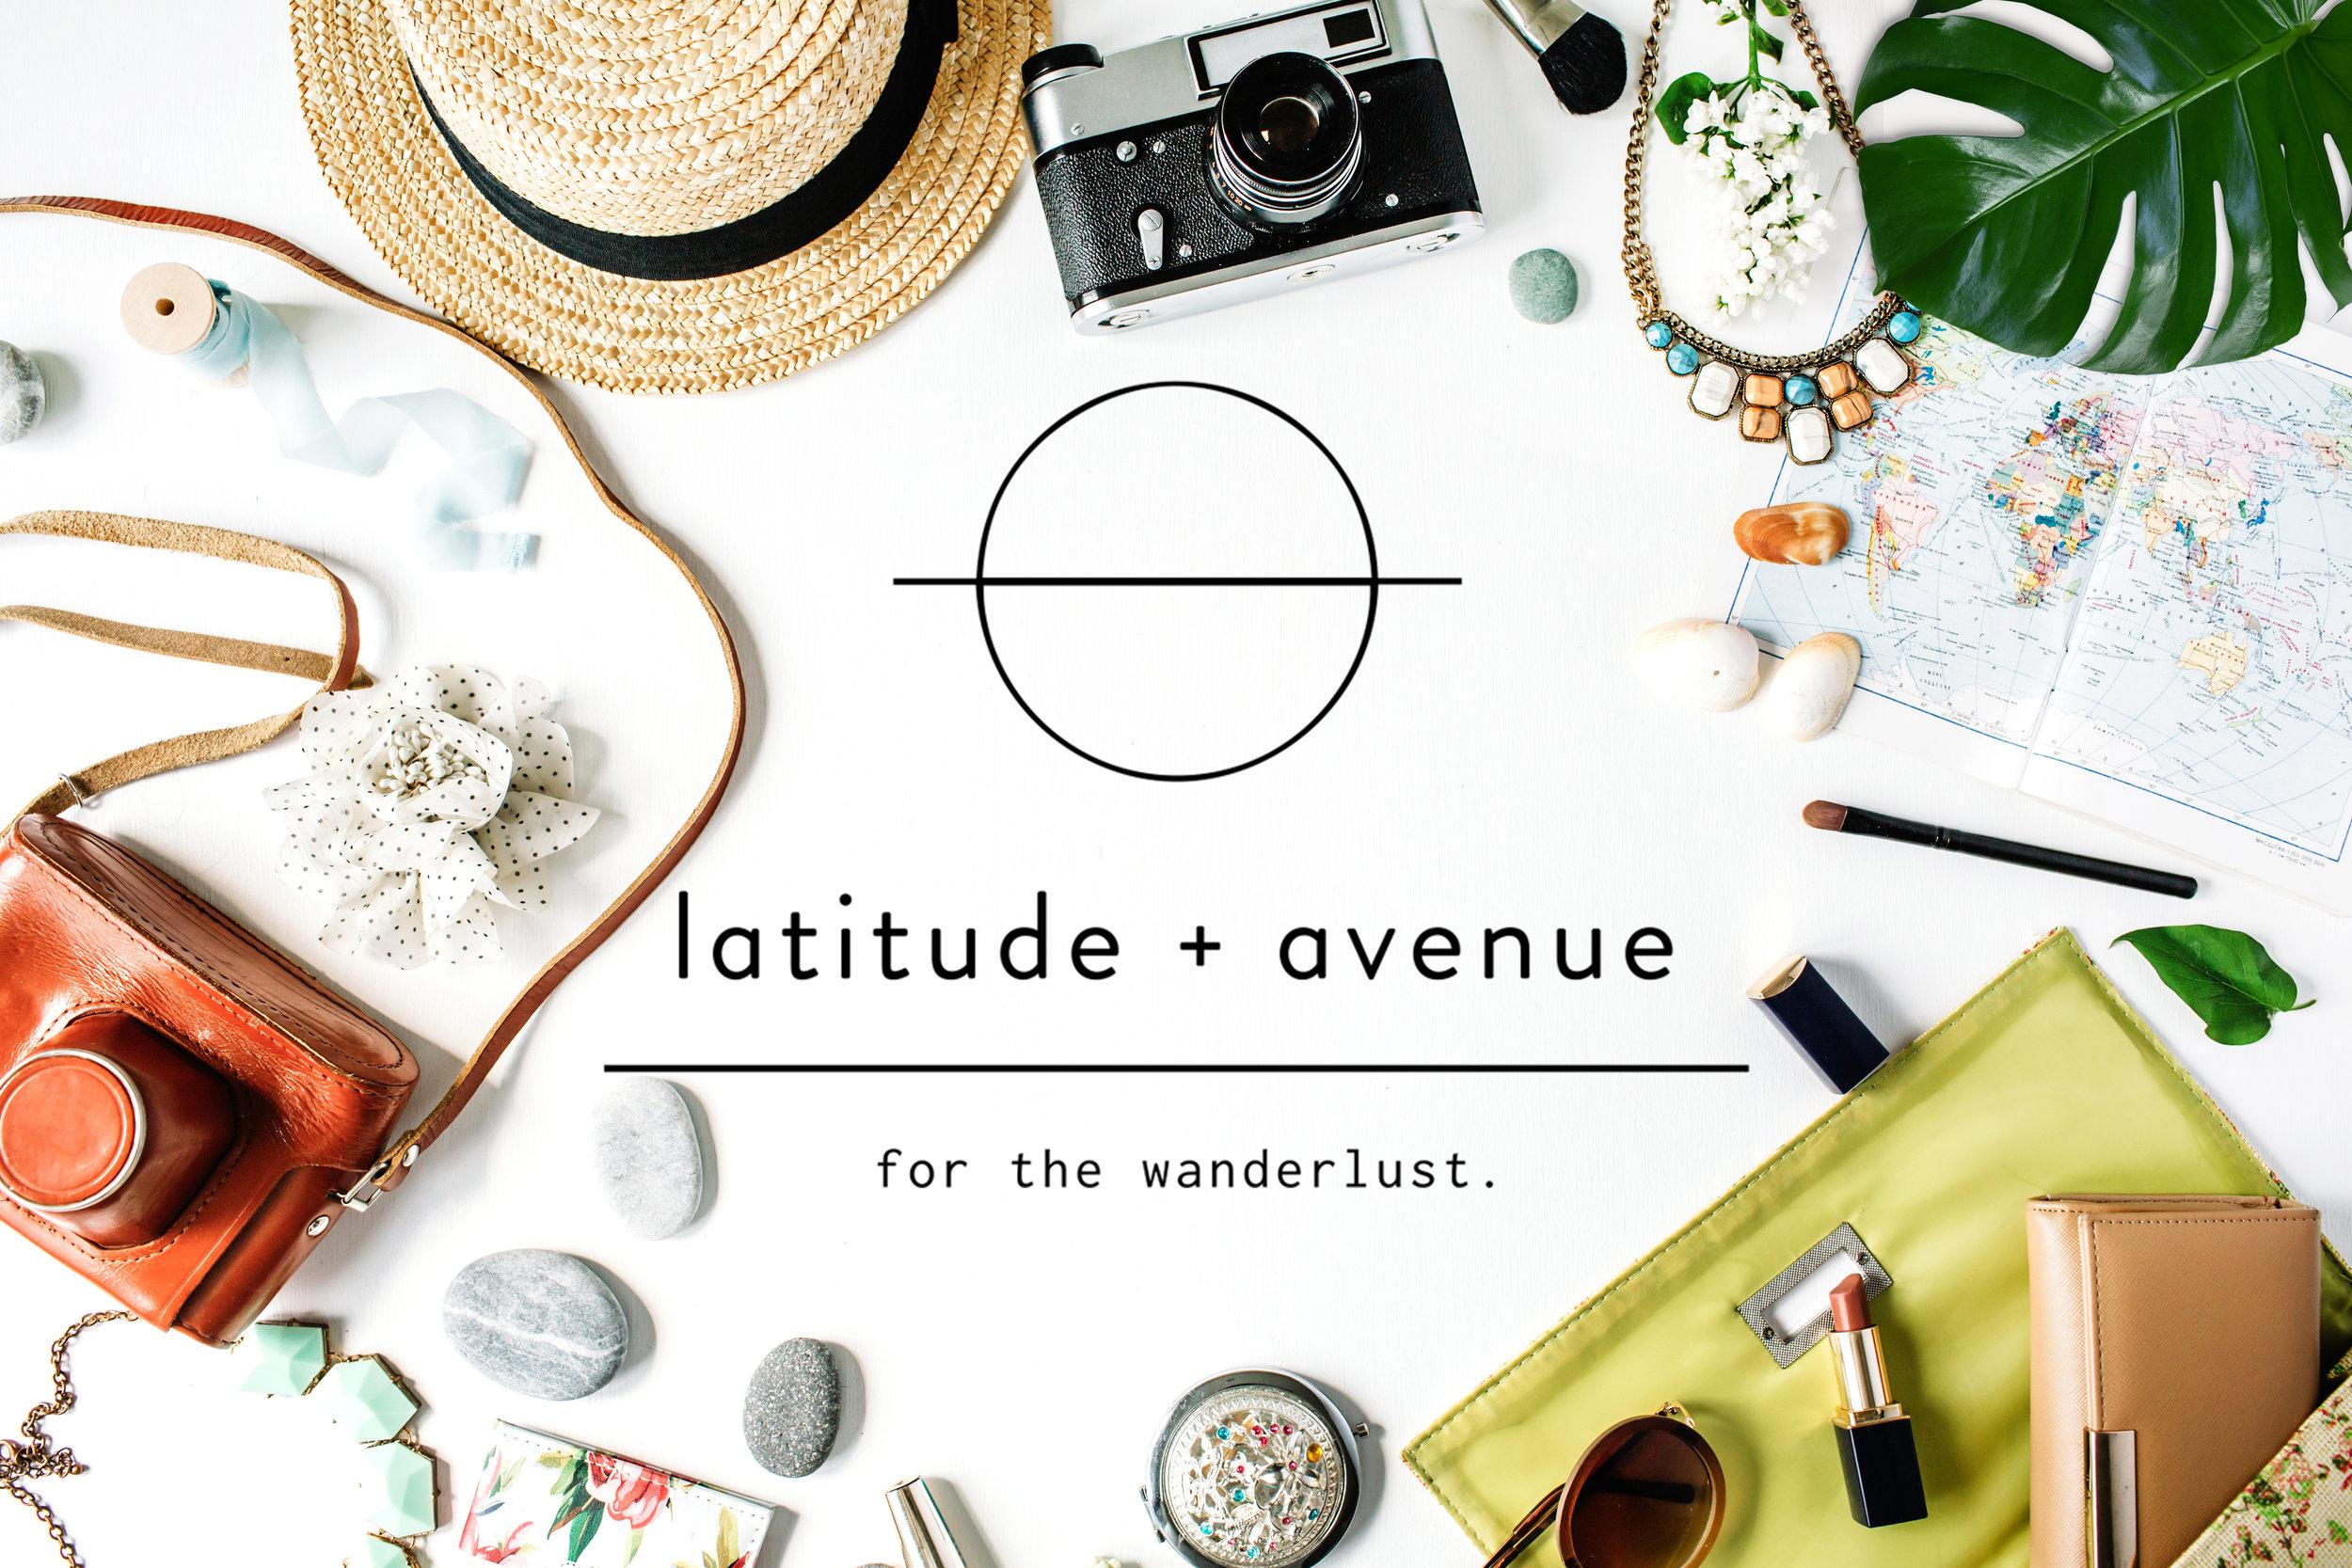 latitudeavenue-banner.jpg